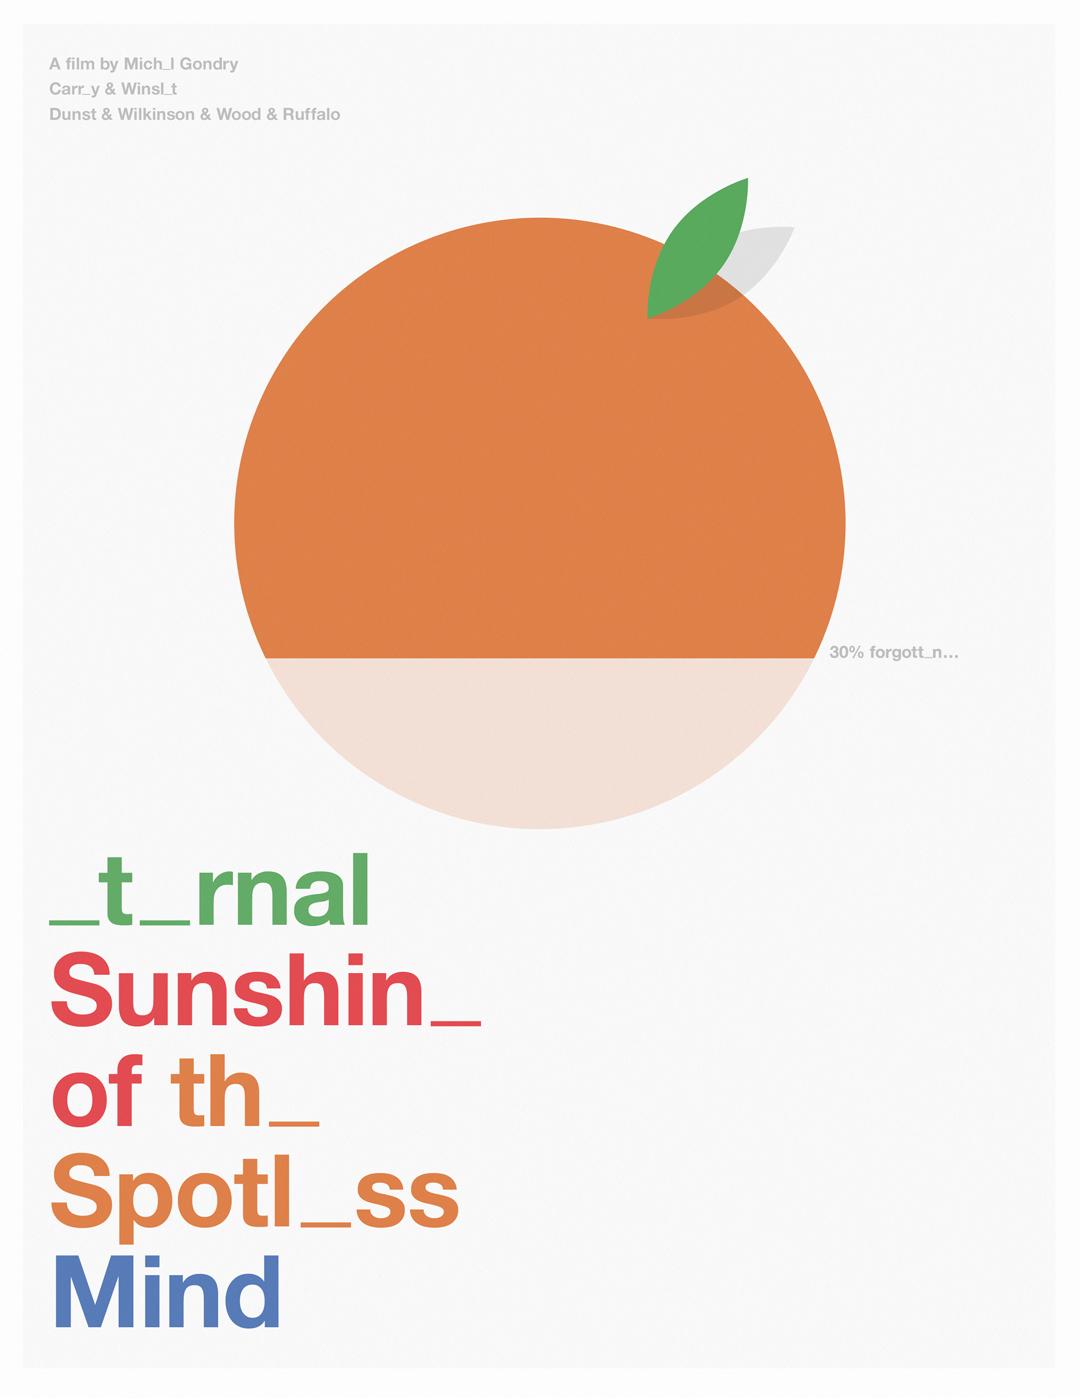 eternalsunshineposter2-web